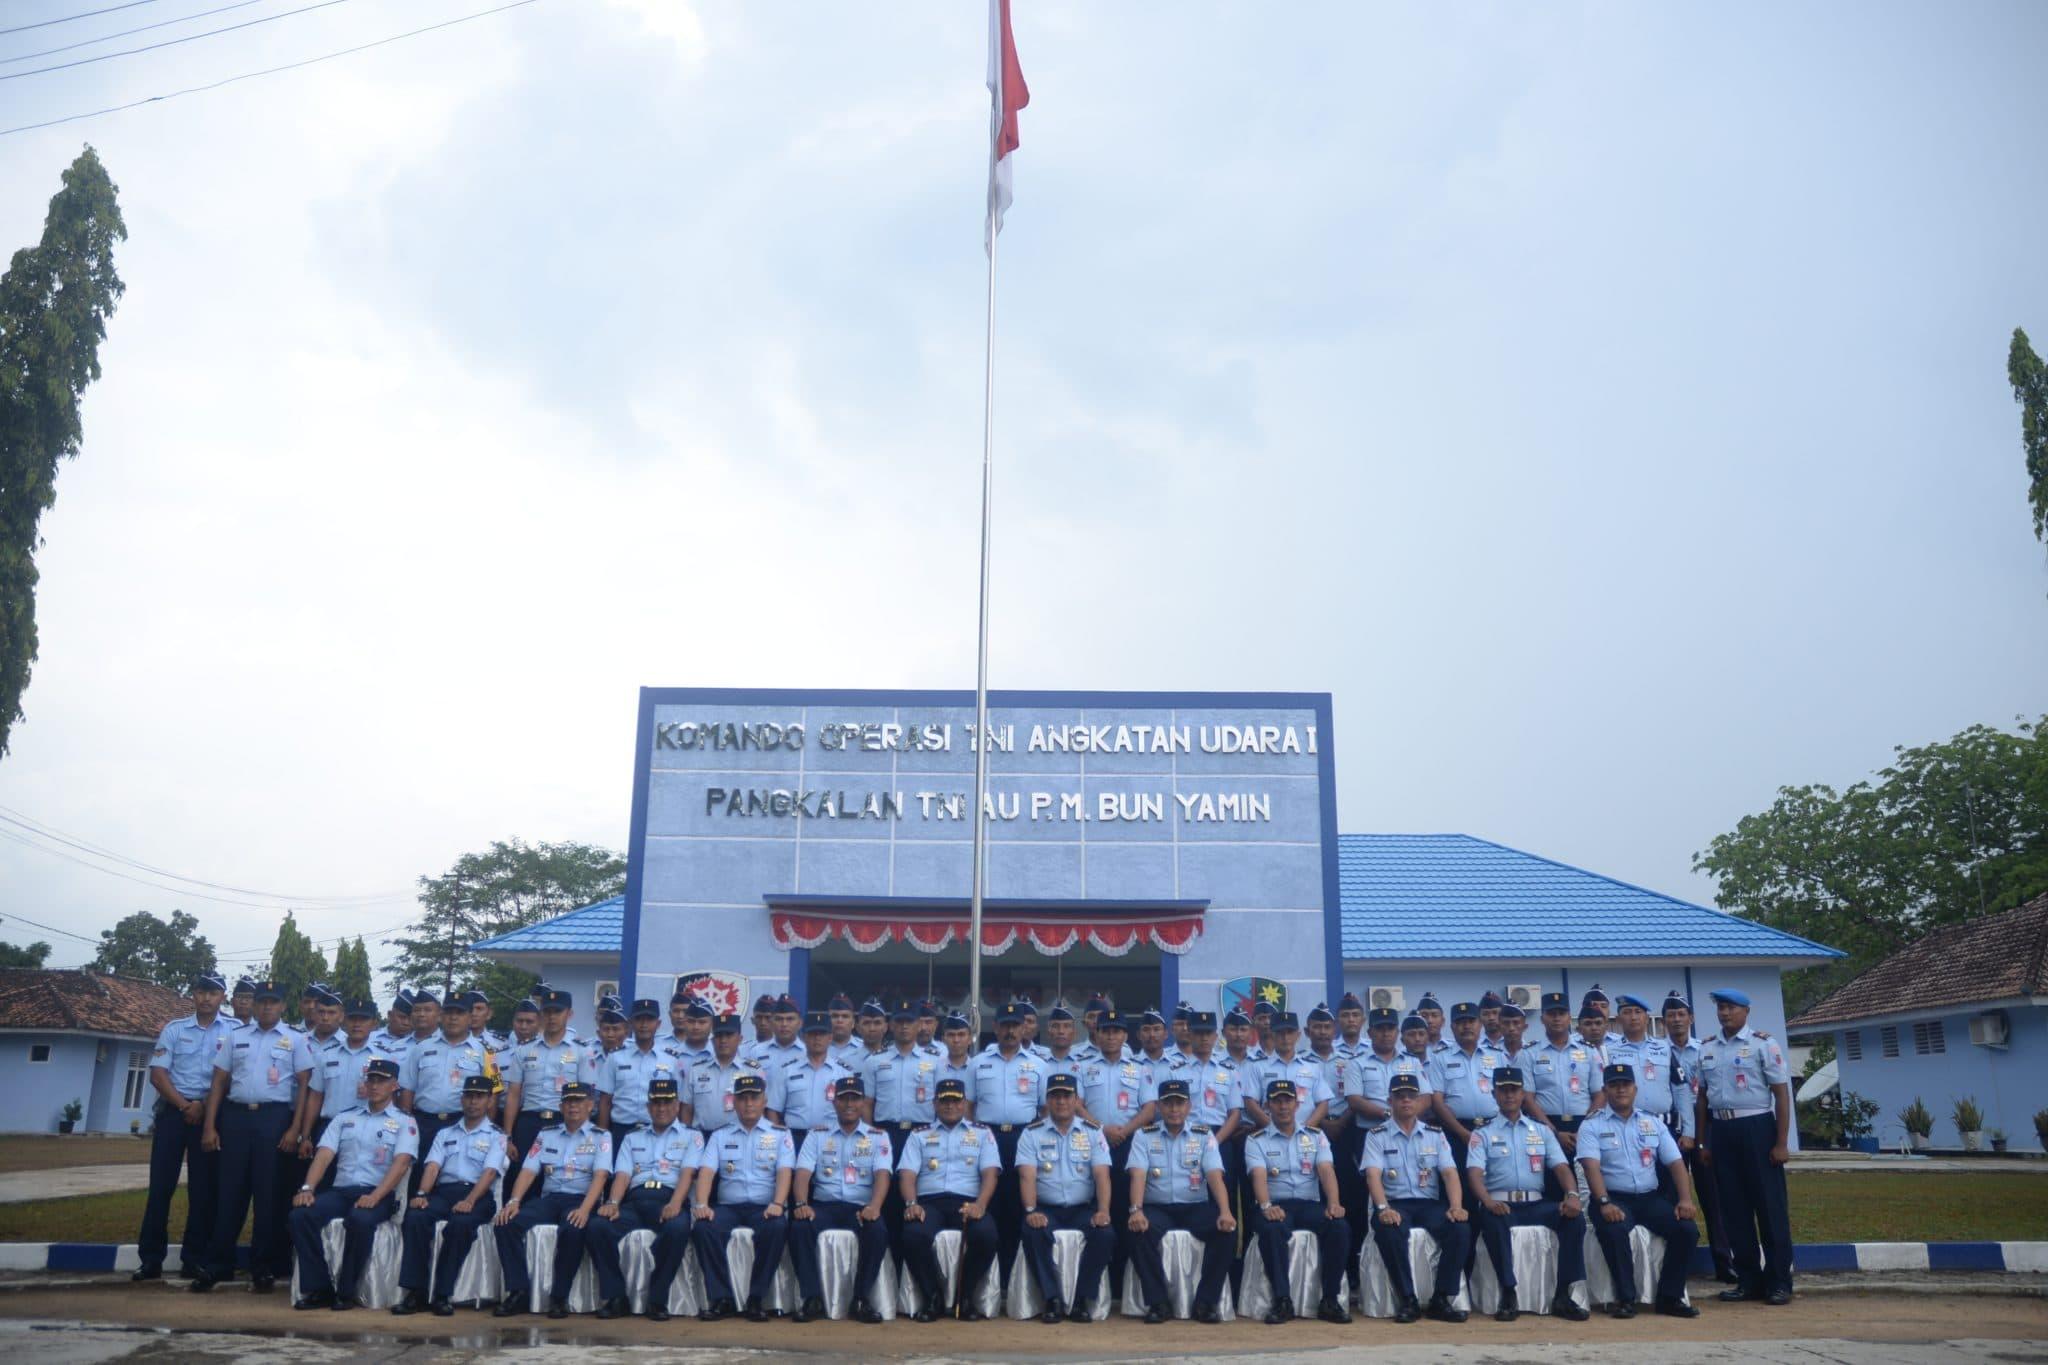 Kunjungan Kerja Pangkoopsau I di Lanud Pangeran M. Bun Yamin.